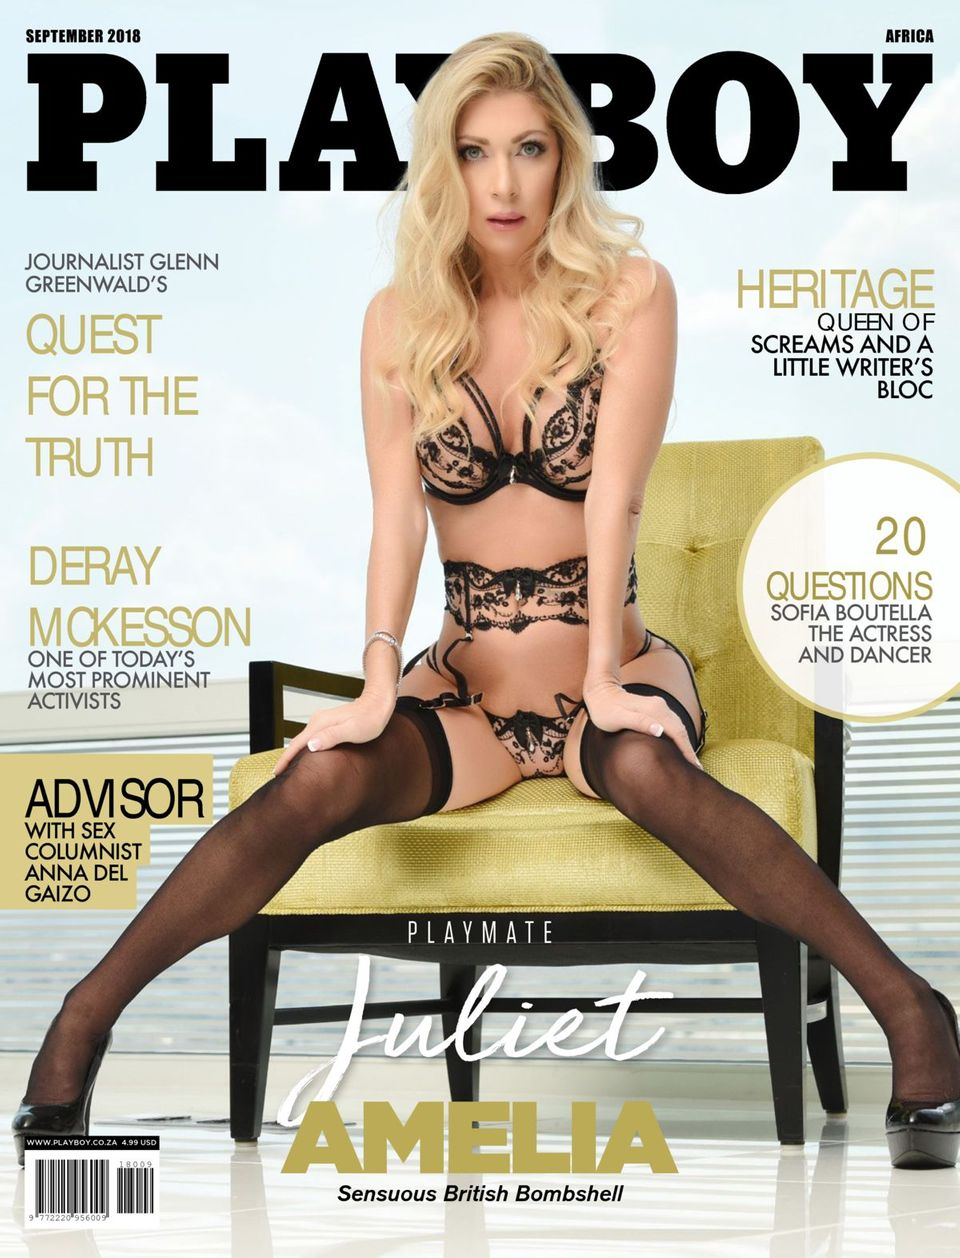 Playboy Africa-September 2018 Magazine - Get your Digital